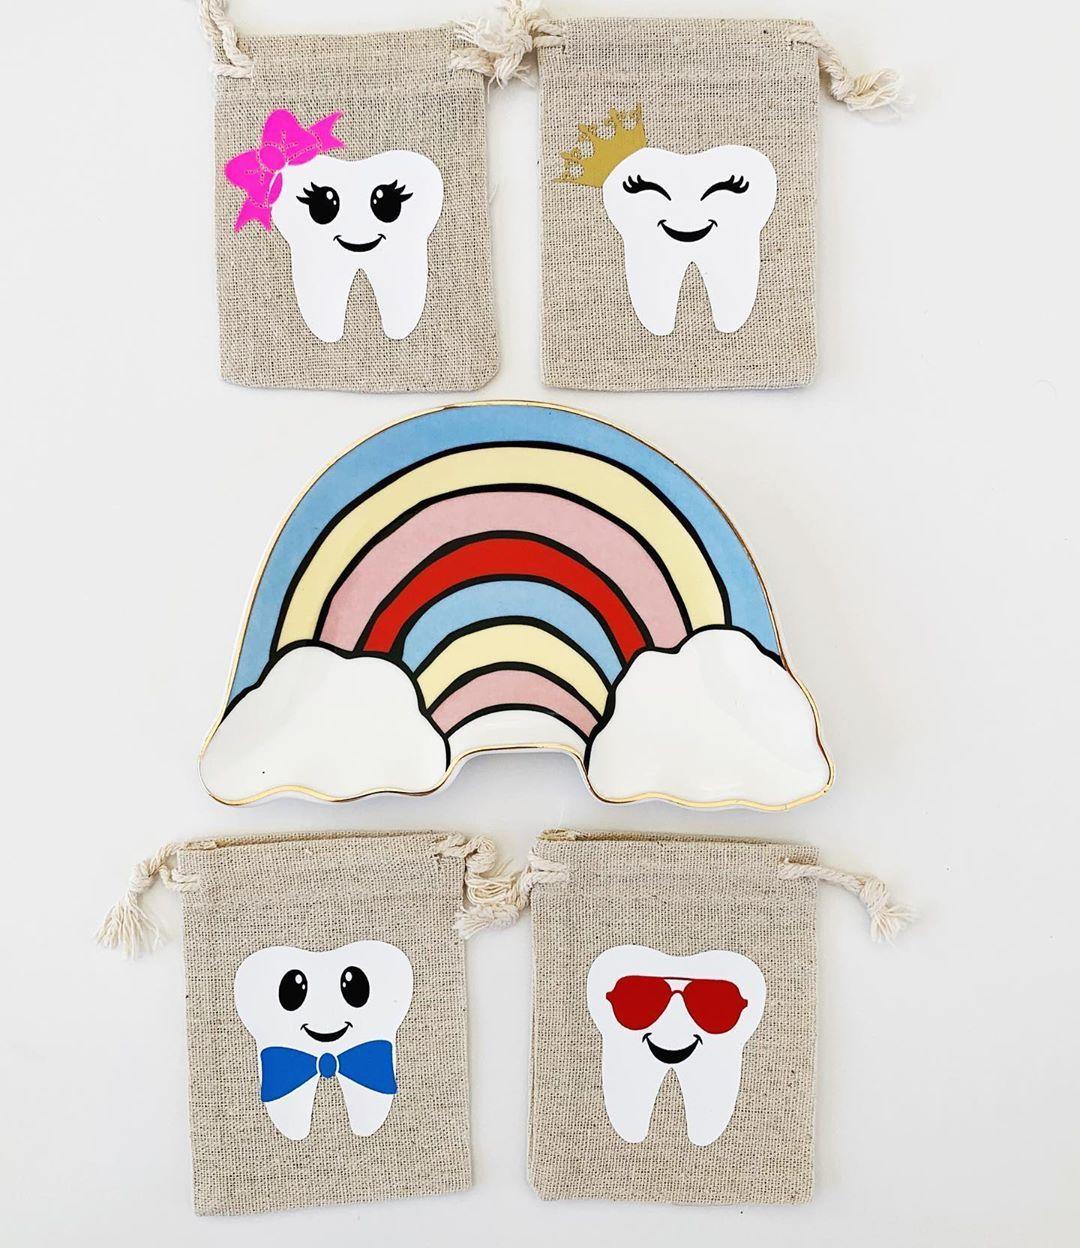 "Lovely Leaf Designs on Instagram: ""🦷 🧚♀️ #toothfairy #toothfairyiscomingtonight #perthmumsgroups #mandurahmums #rockinghammums #perthsmall #shoplocalperth #handmadeinwa…"""